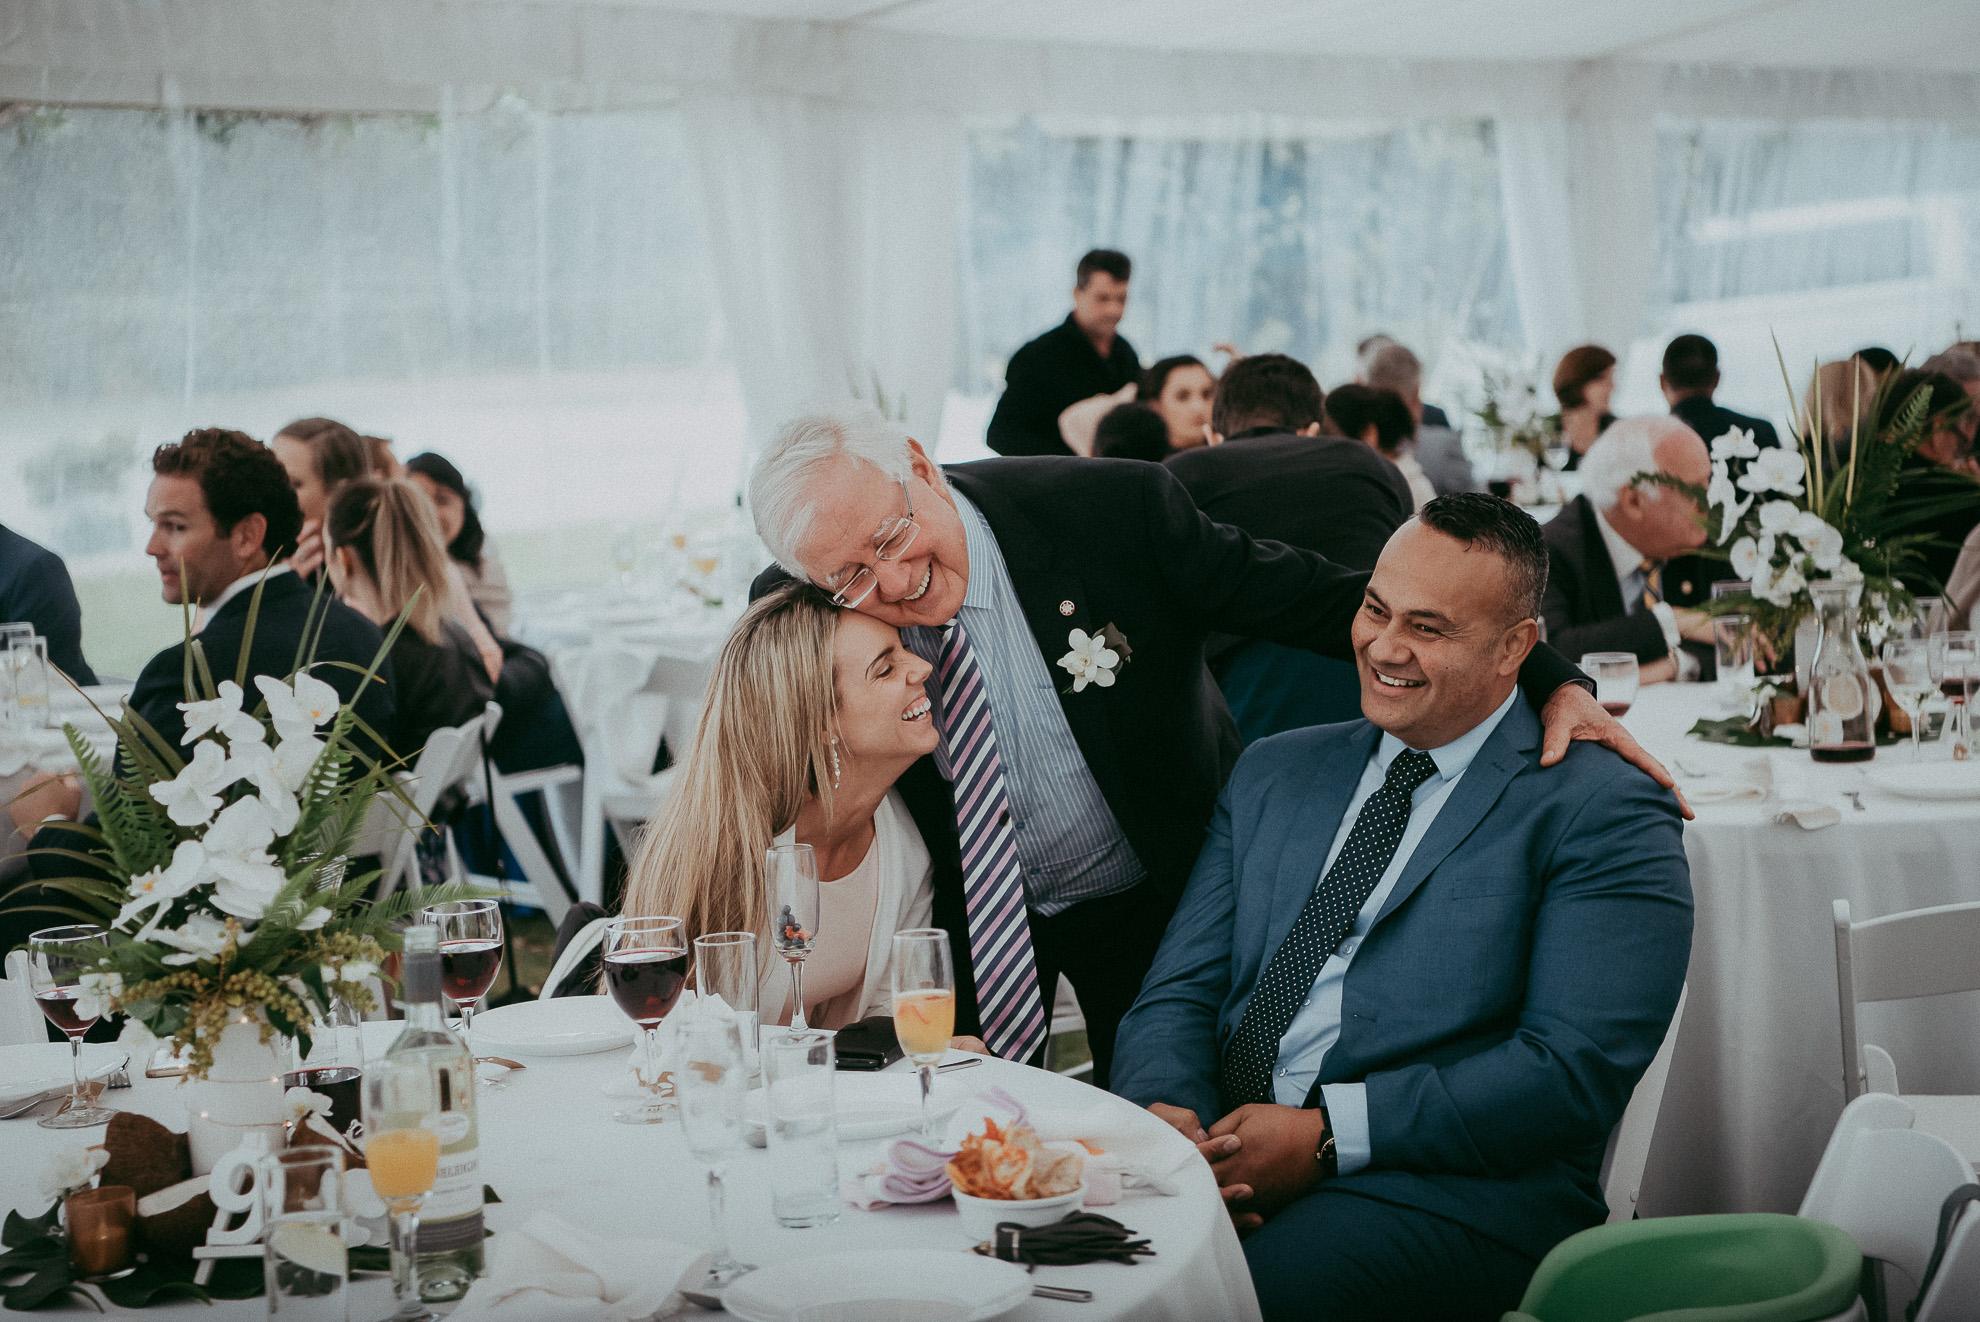 wedding-by-levien-738.JPG